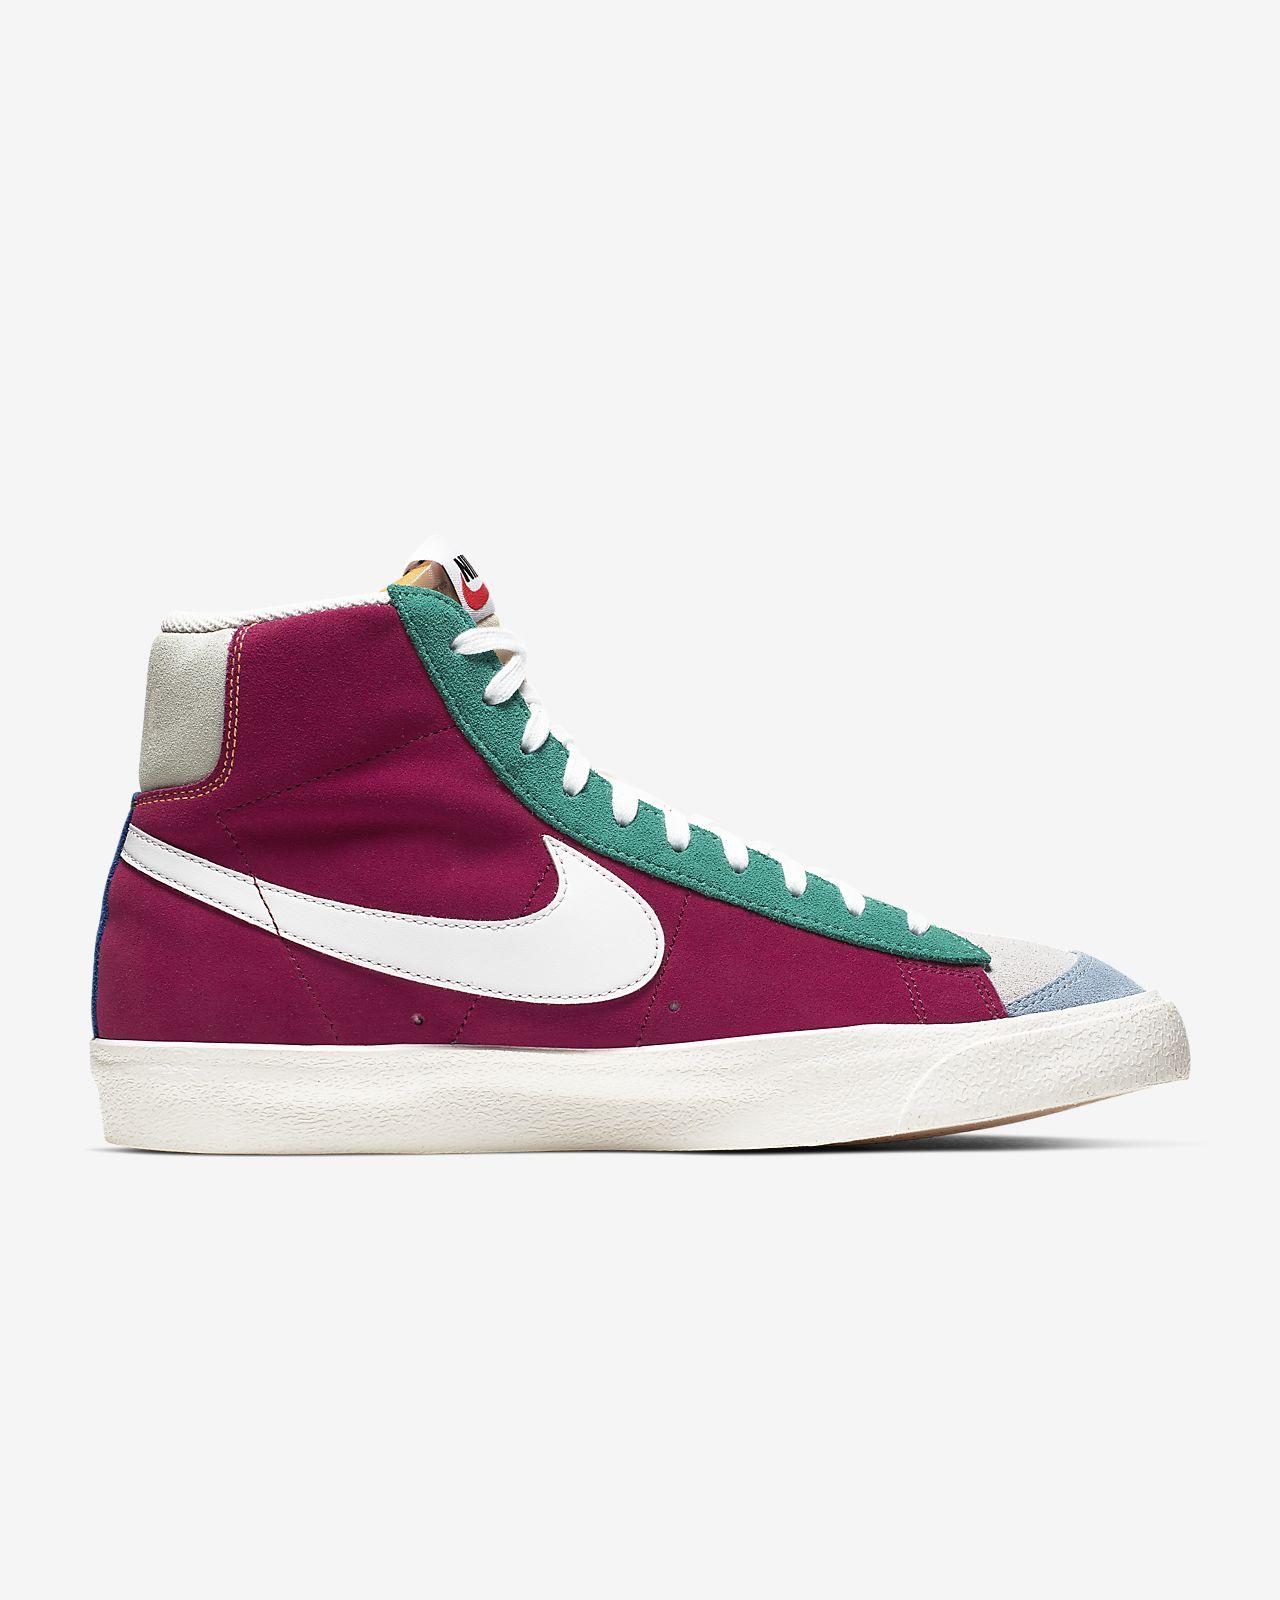 Nike Blazer Hi Suede Vintage Shoes Bags